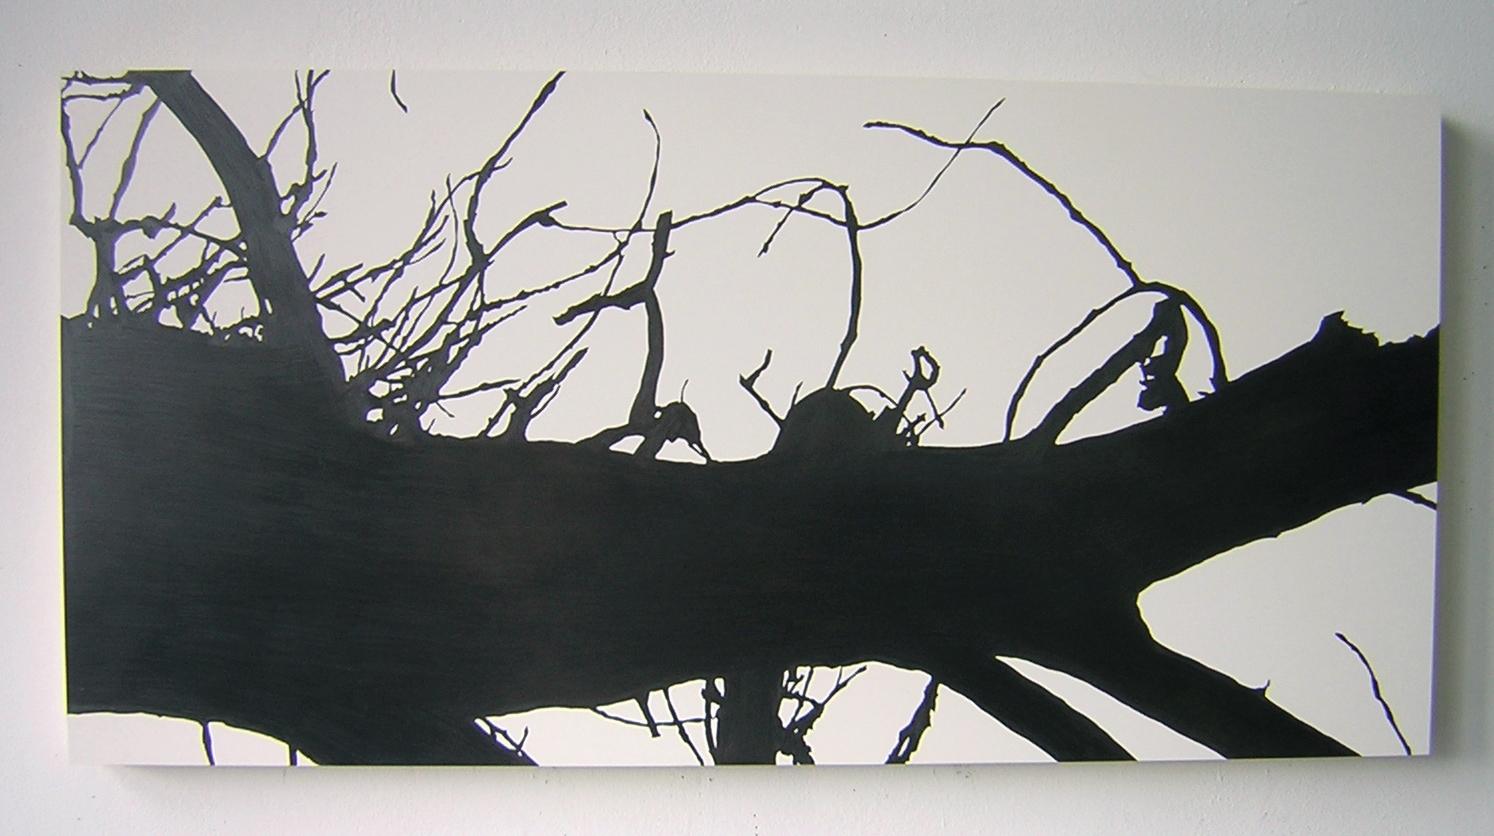 "NightFall , 2004 Pencil on clayboard panel 16"" x 32"" SOLD"